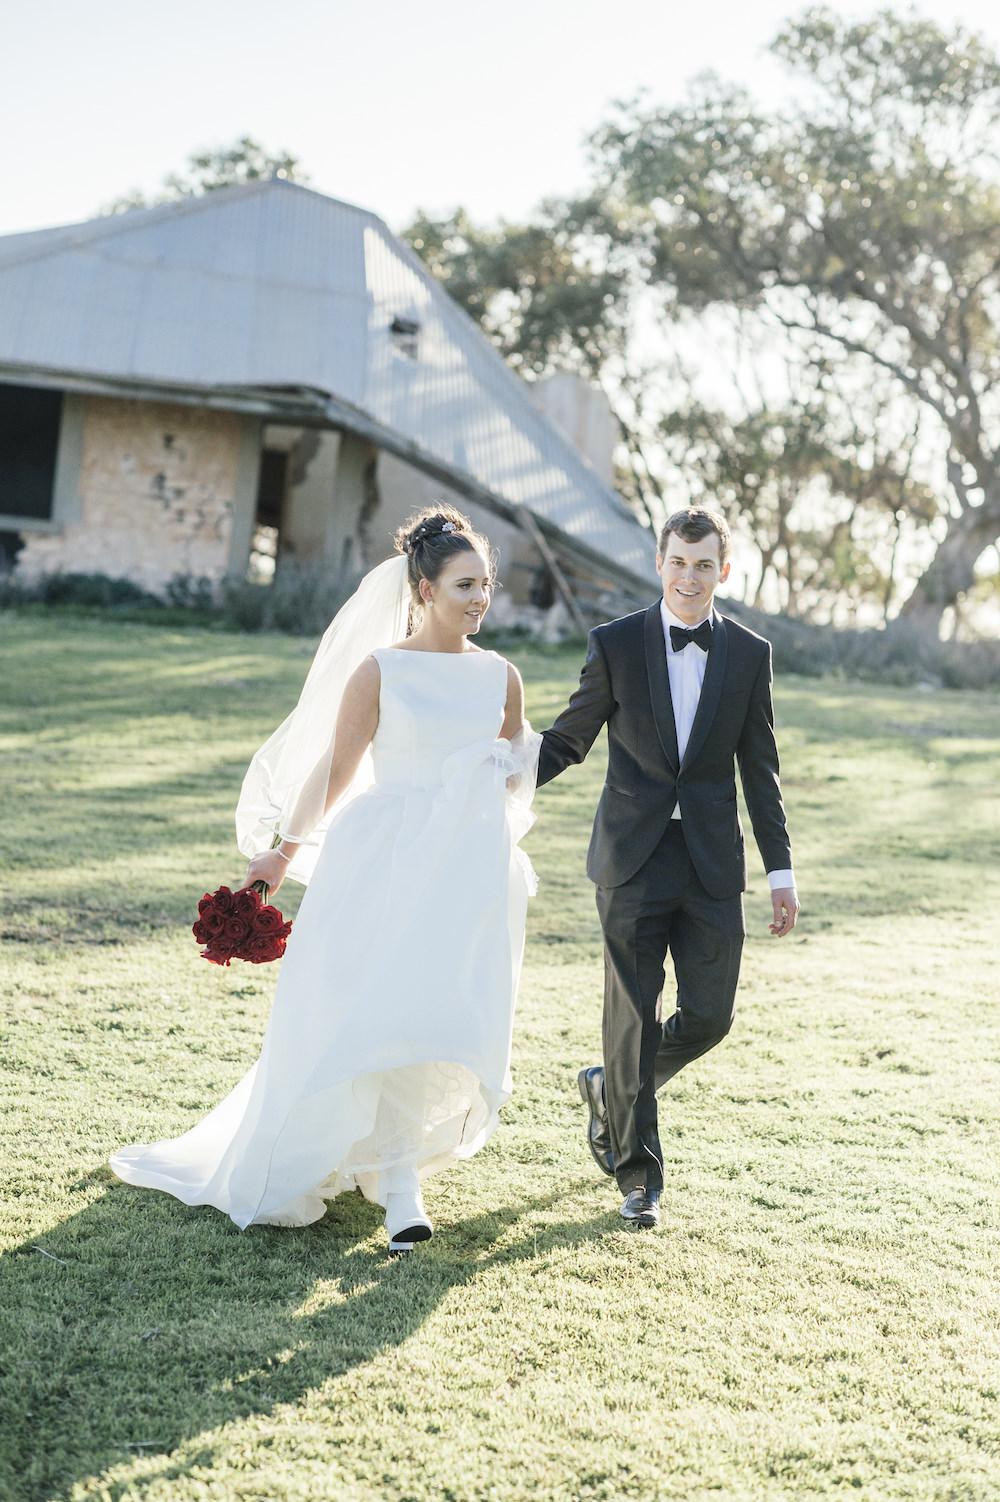 lindahamish-wedding-338.JPG